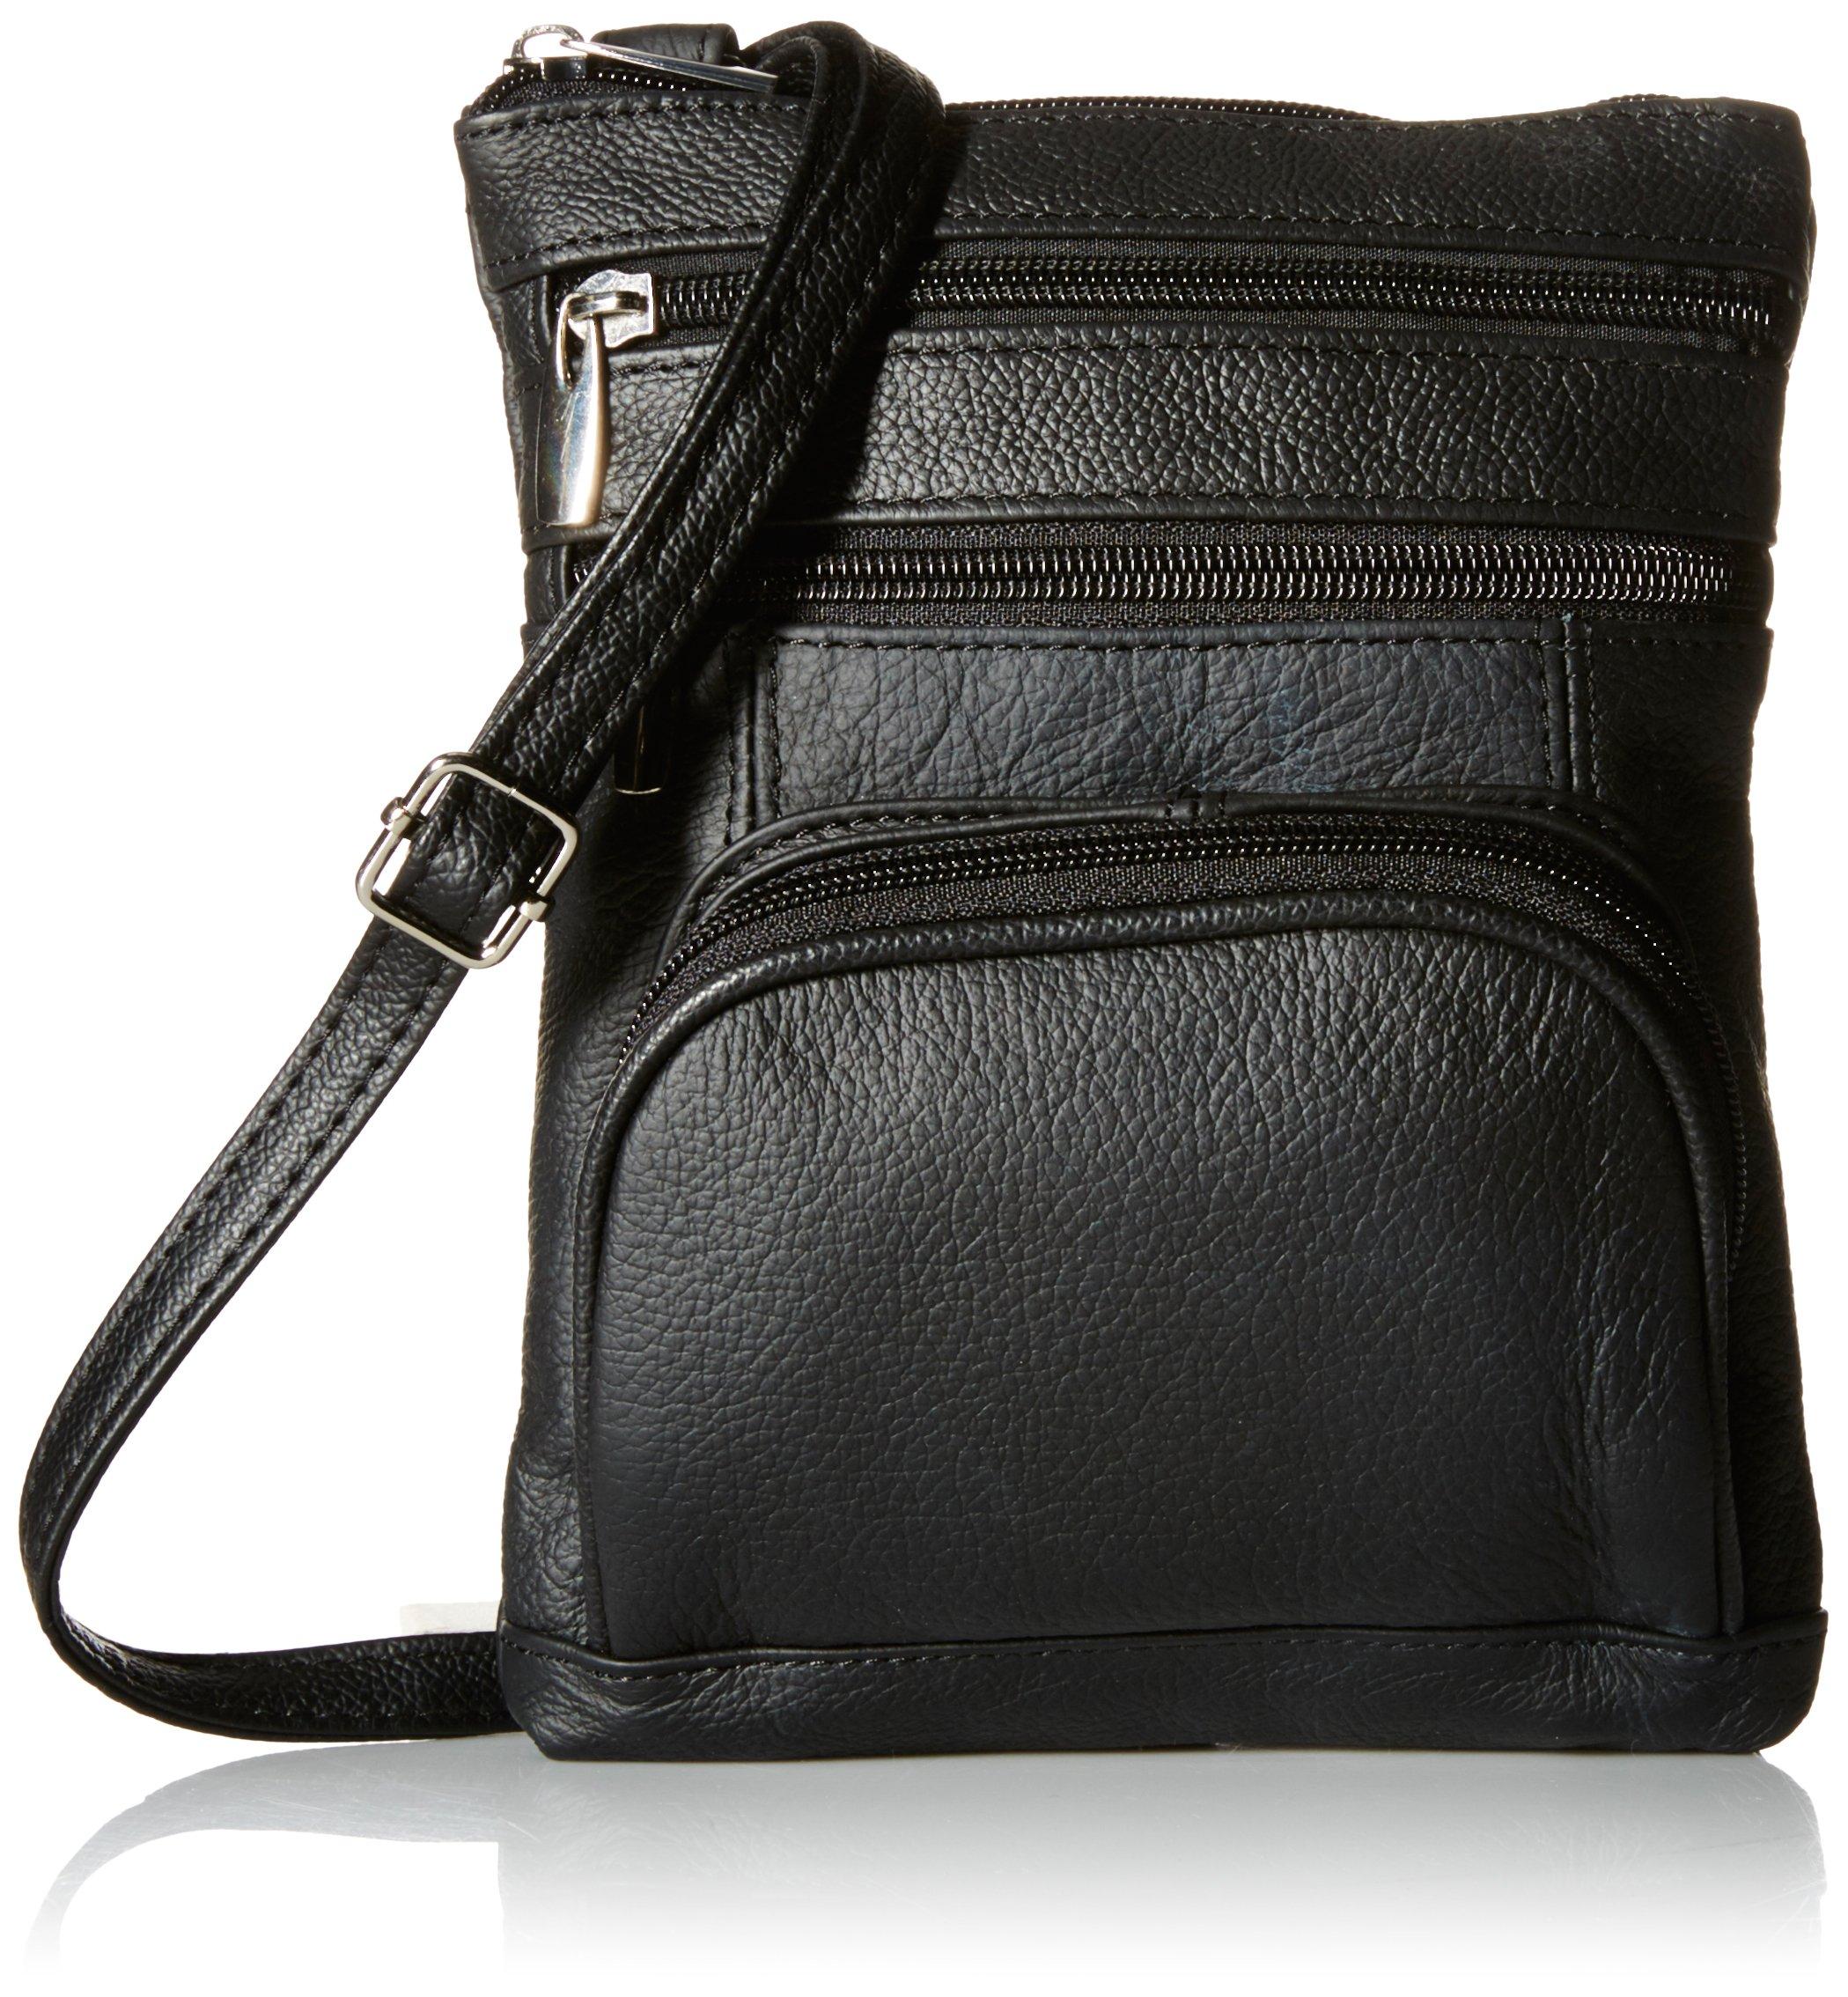 Roma Leathers Genuine Leather Multi Pocket Crossbody Bag (Black)